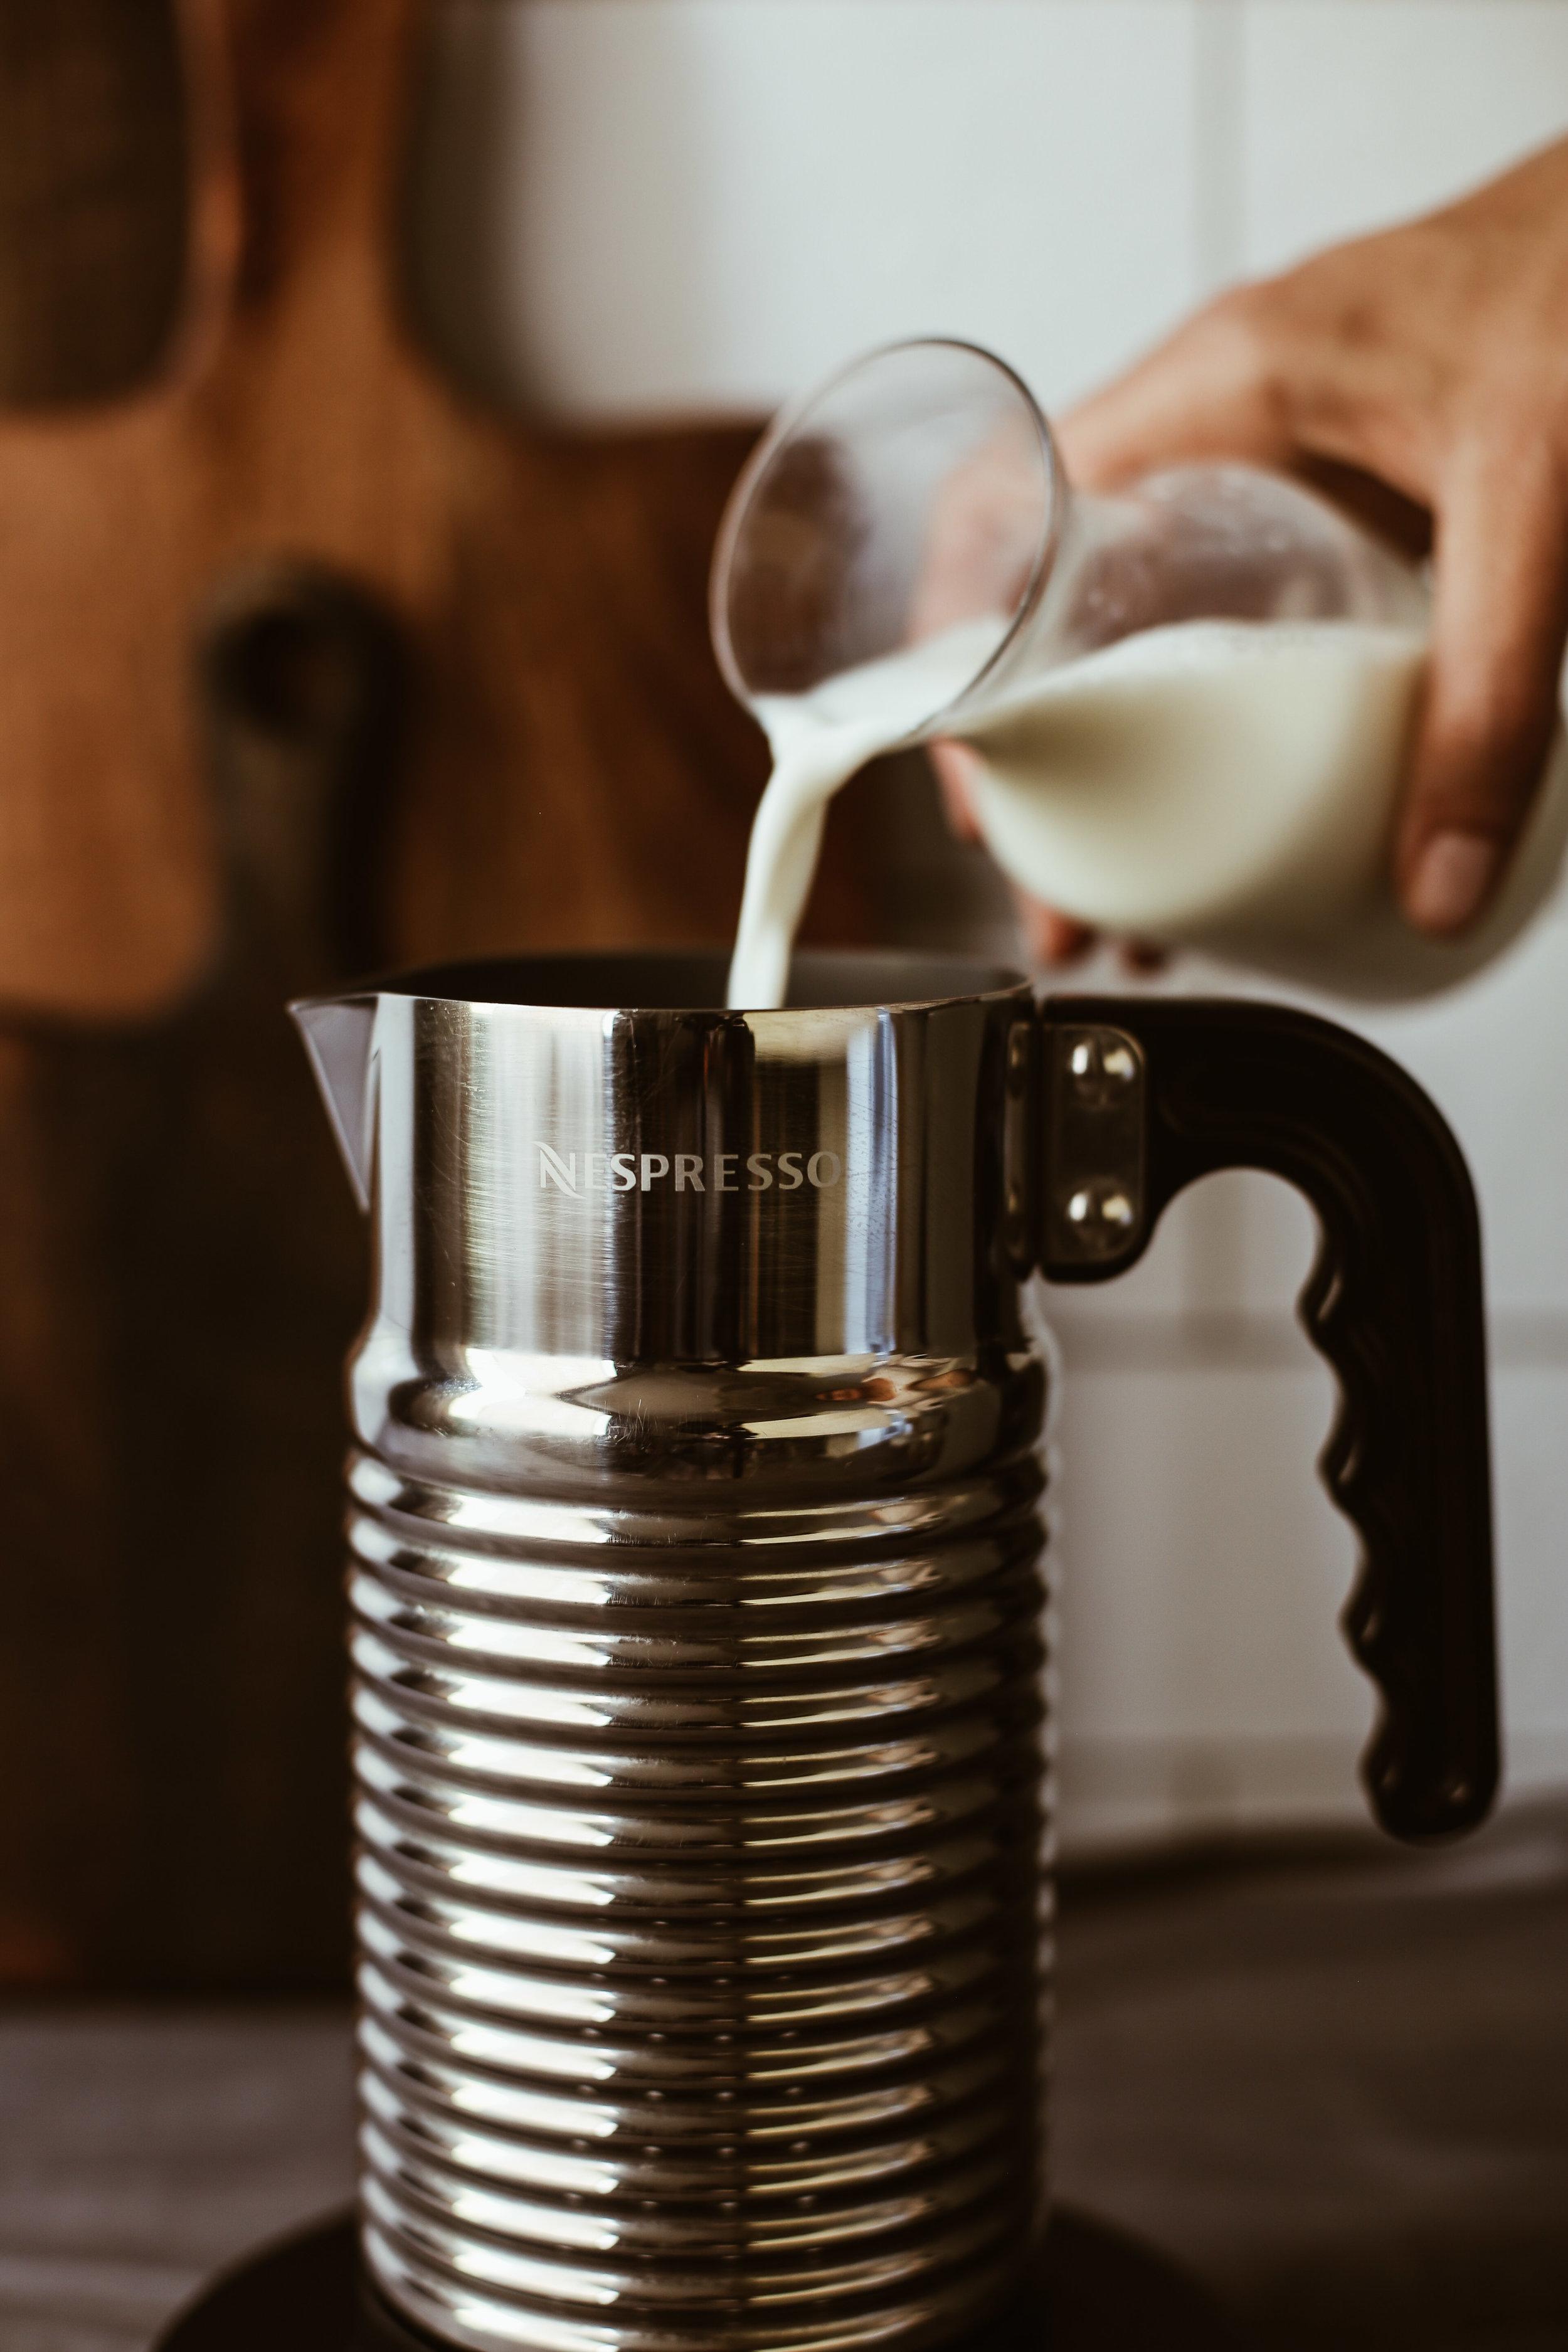 Nespresso Campfire Mocha Recipe11.jpg